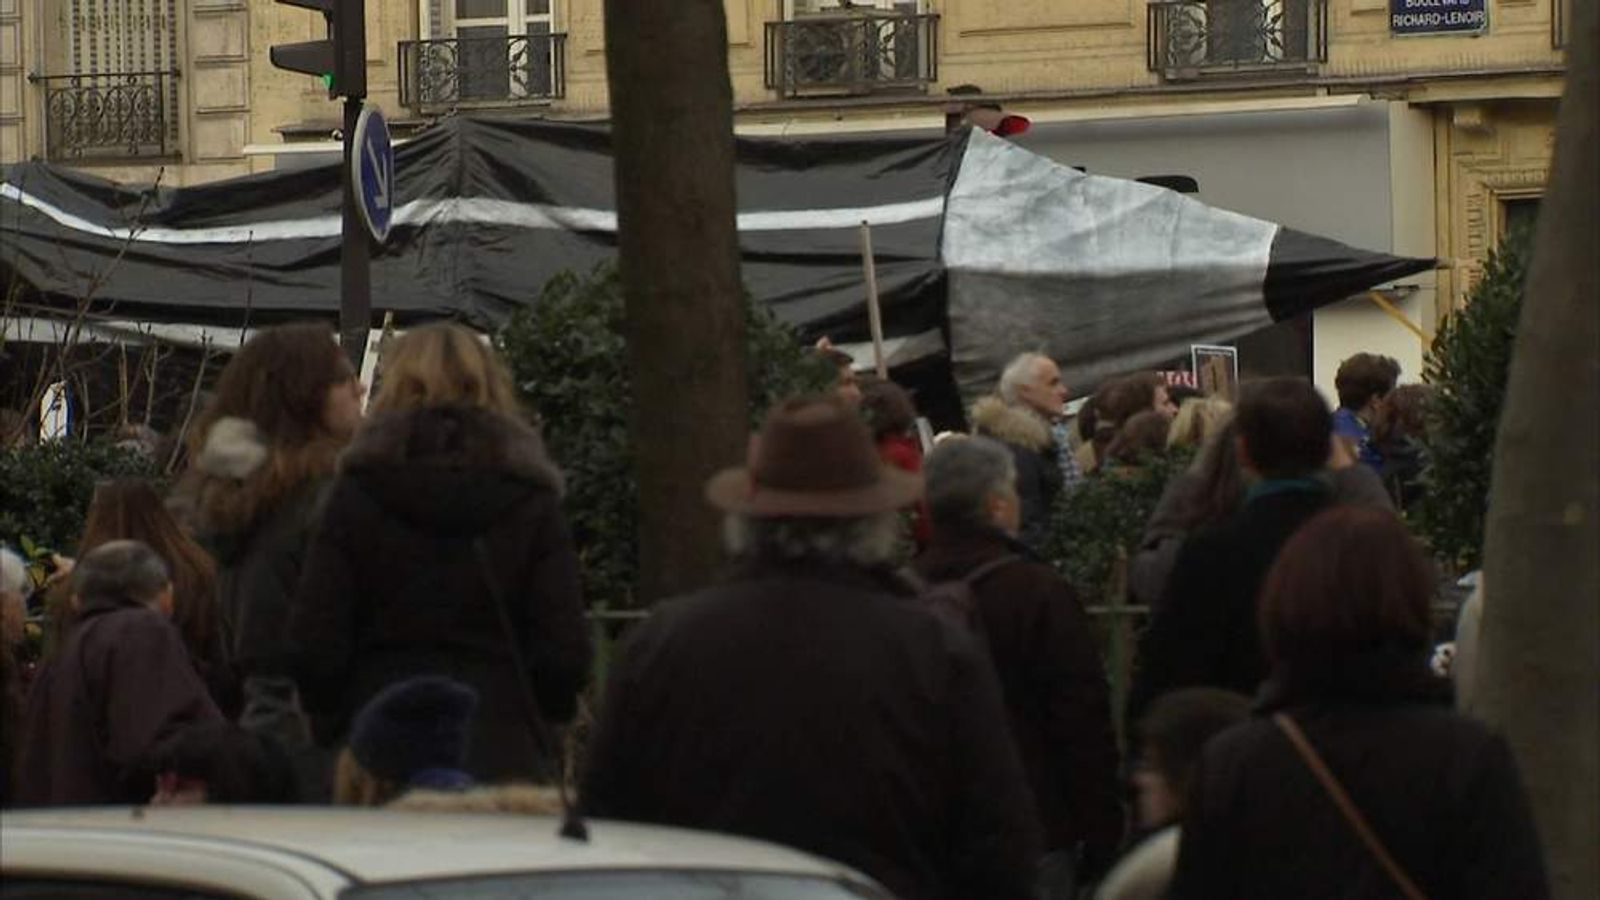 Large pencil carried through Paris streets